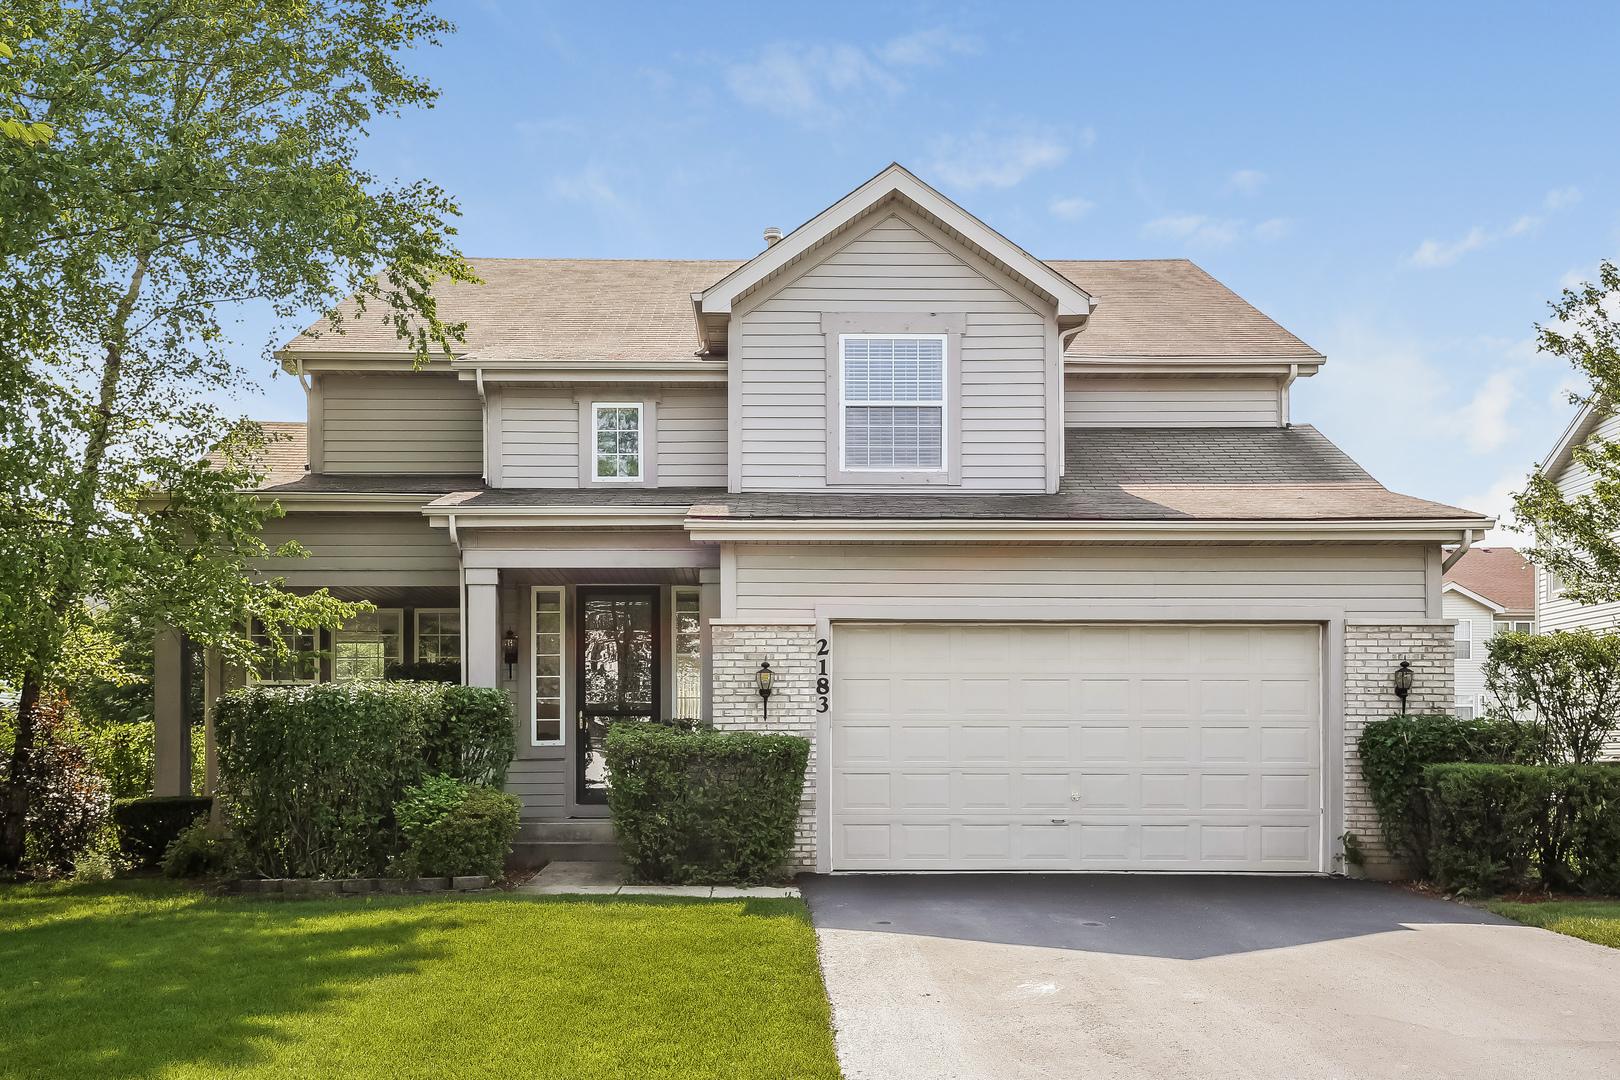 2183 Avalon Drive, Buffalo Grove, Illinois 60089